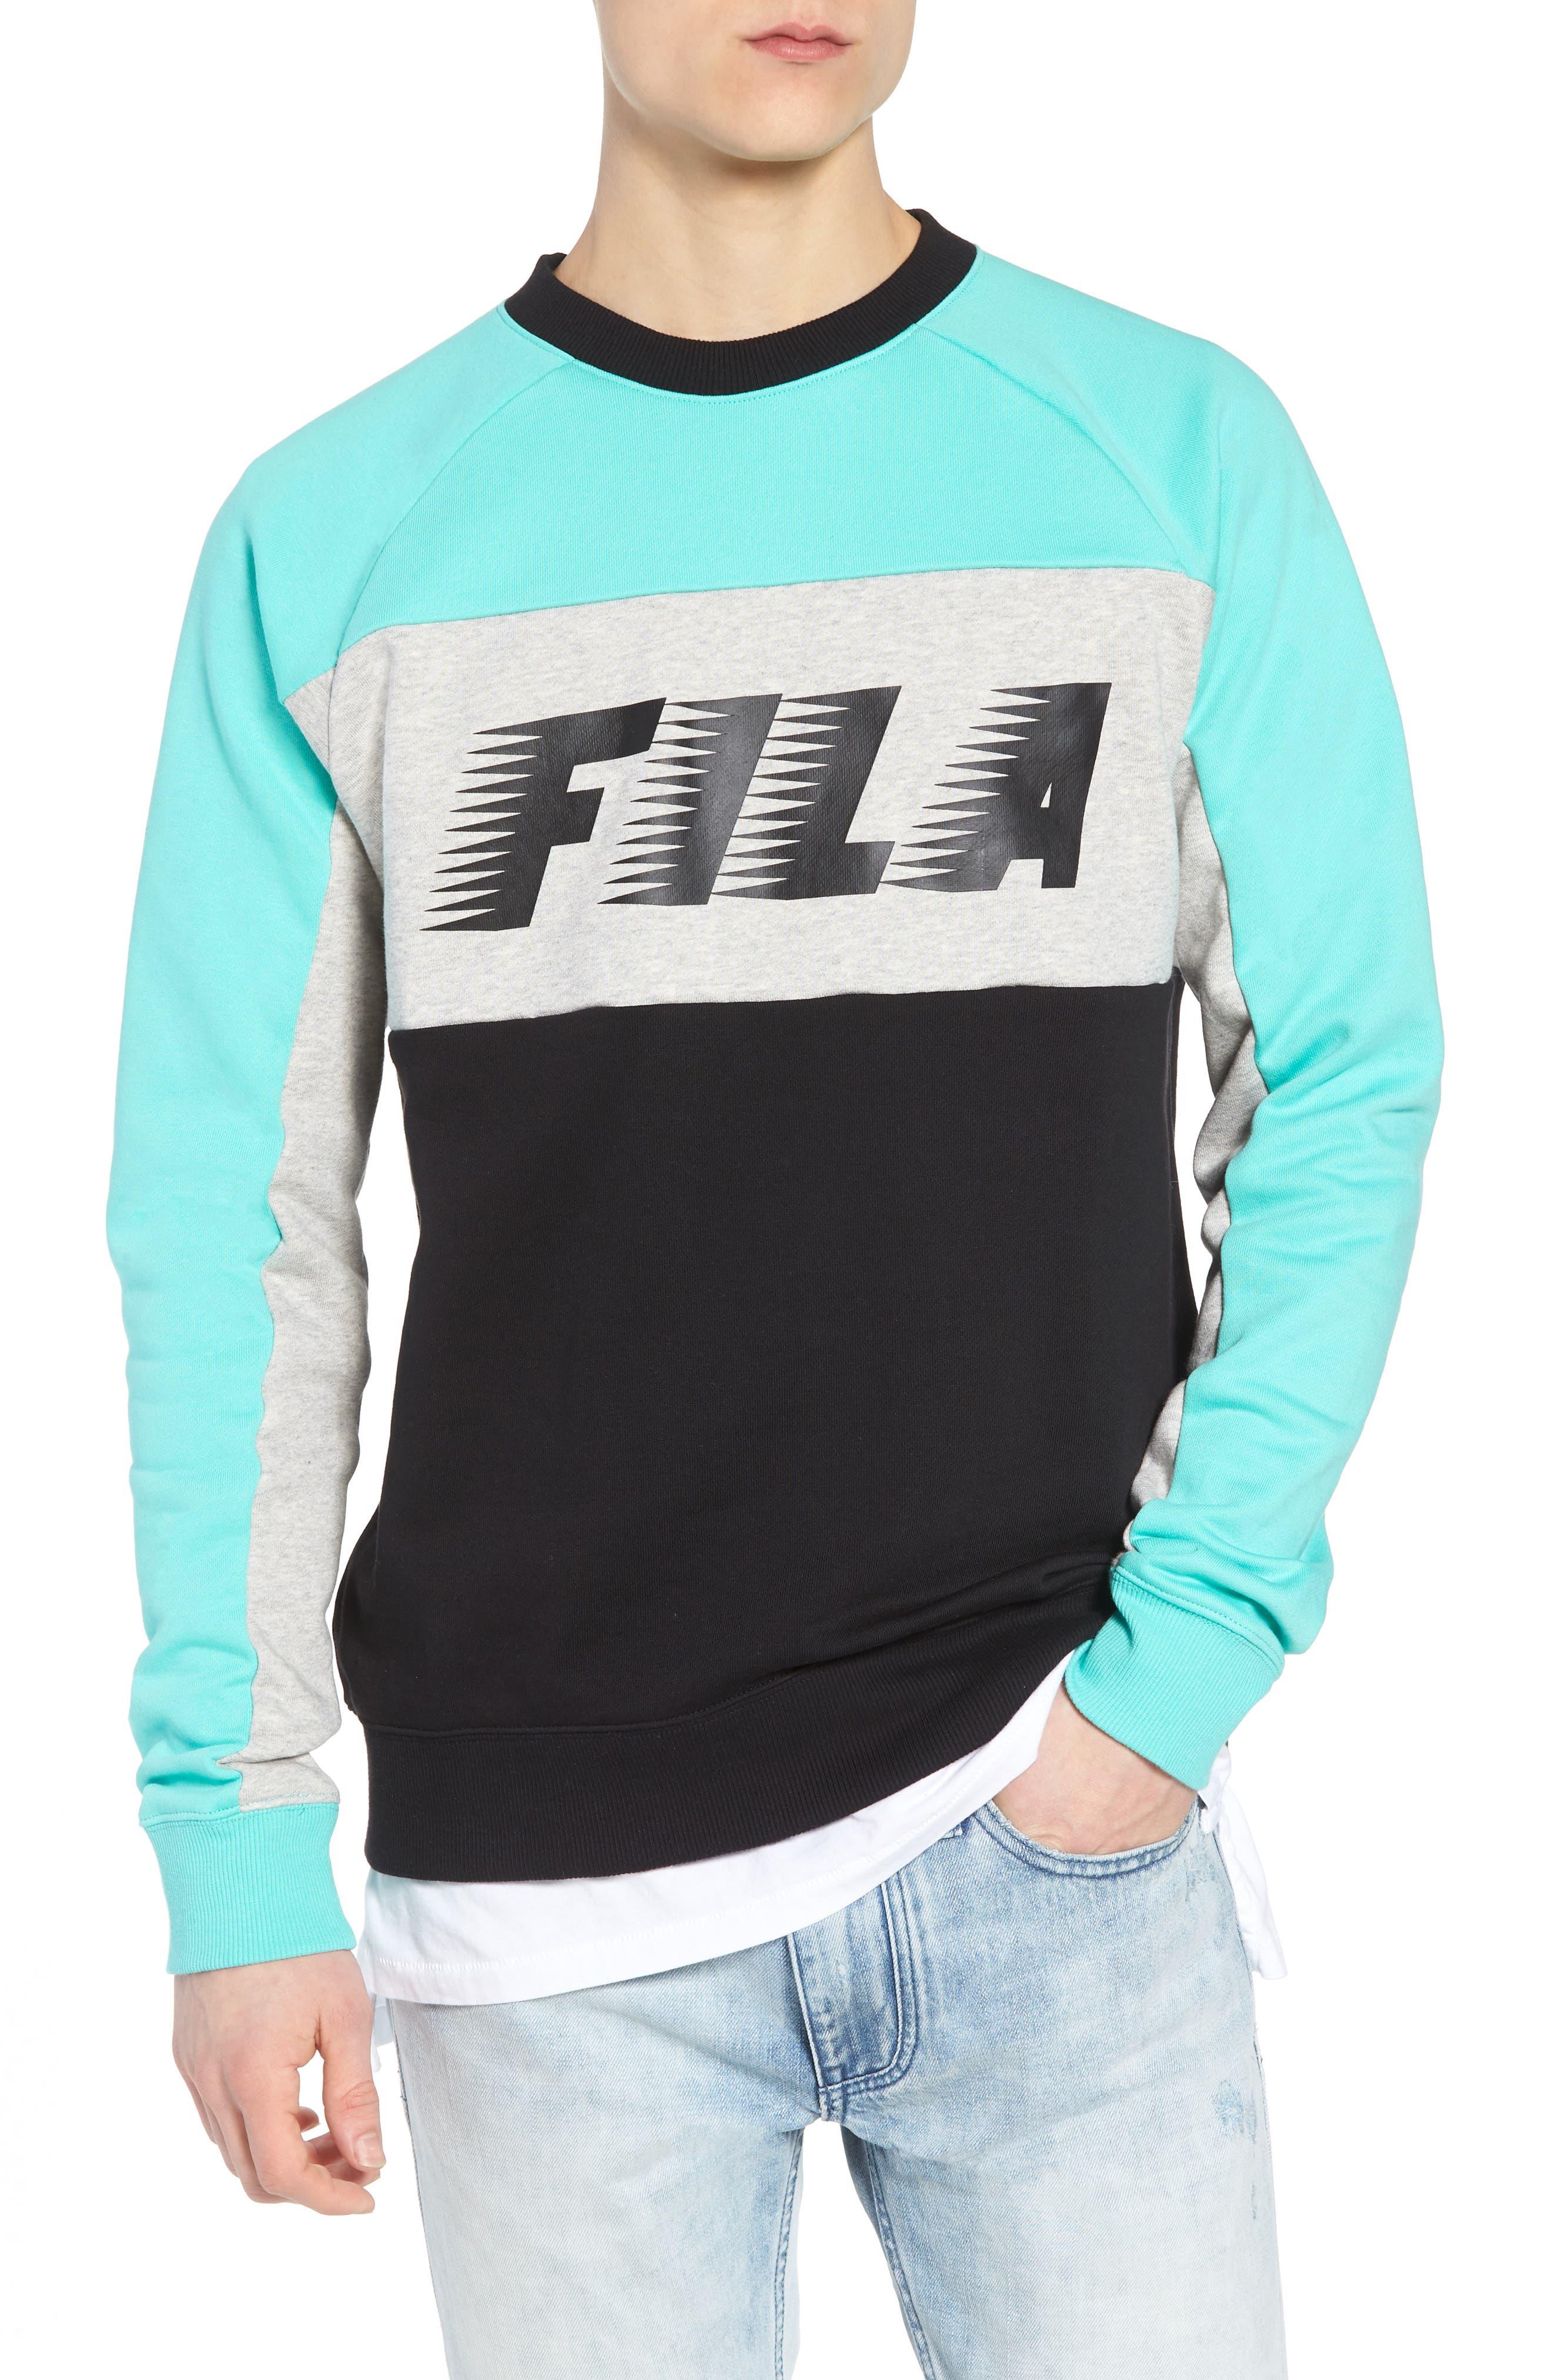 Layton Sweatshirt,                         Main,                         color, Black/ Cockatoo/ Grey Marl